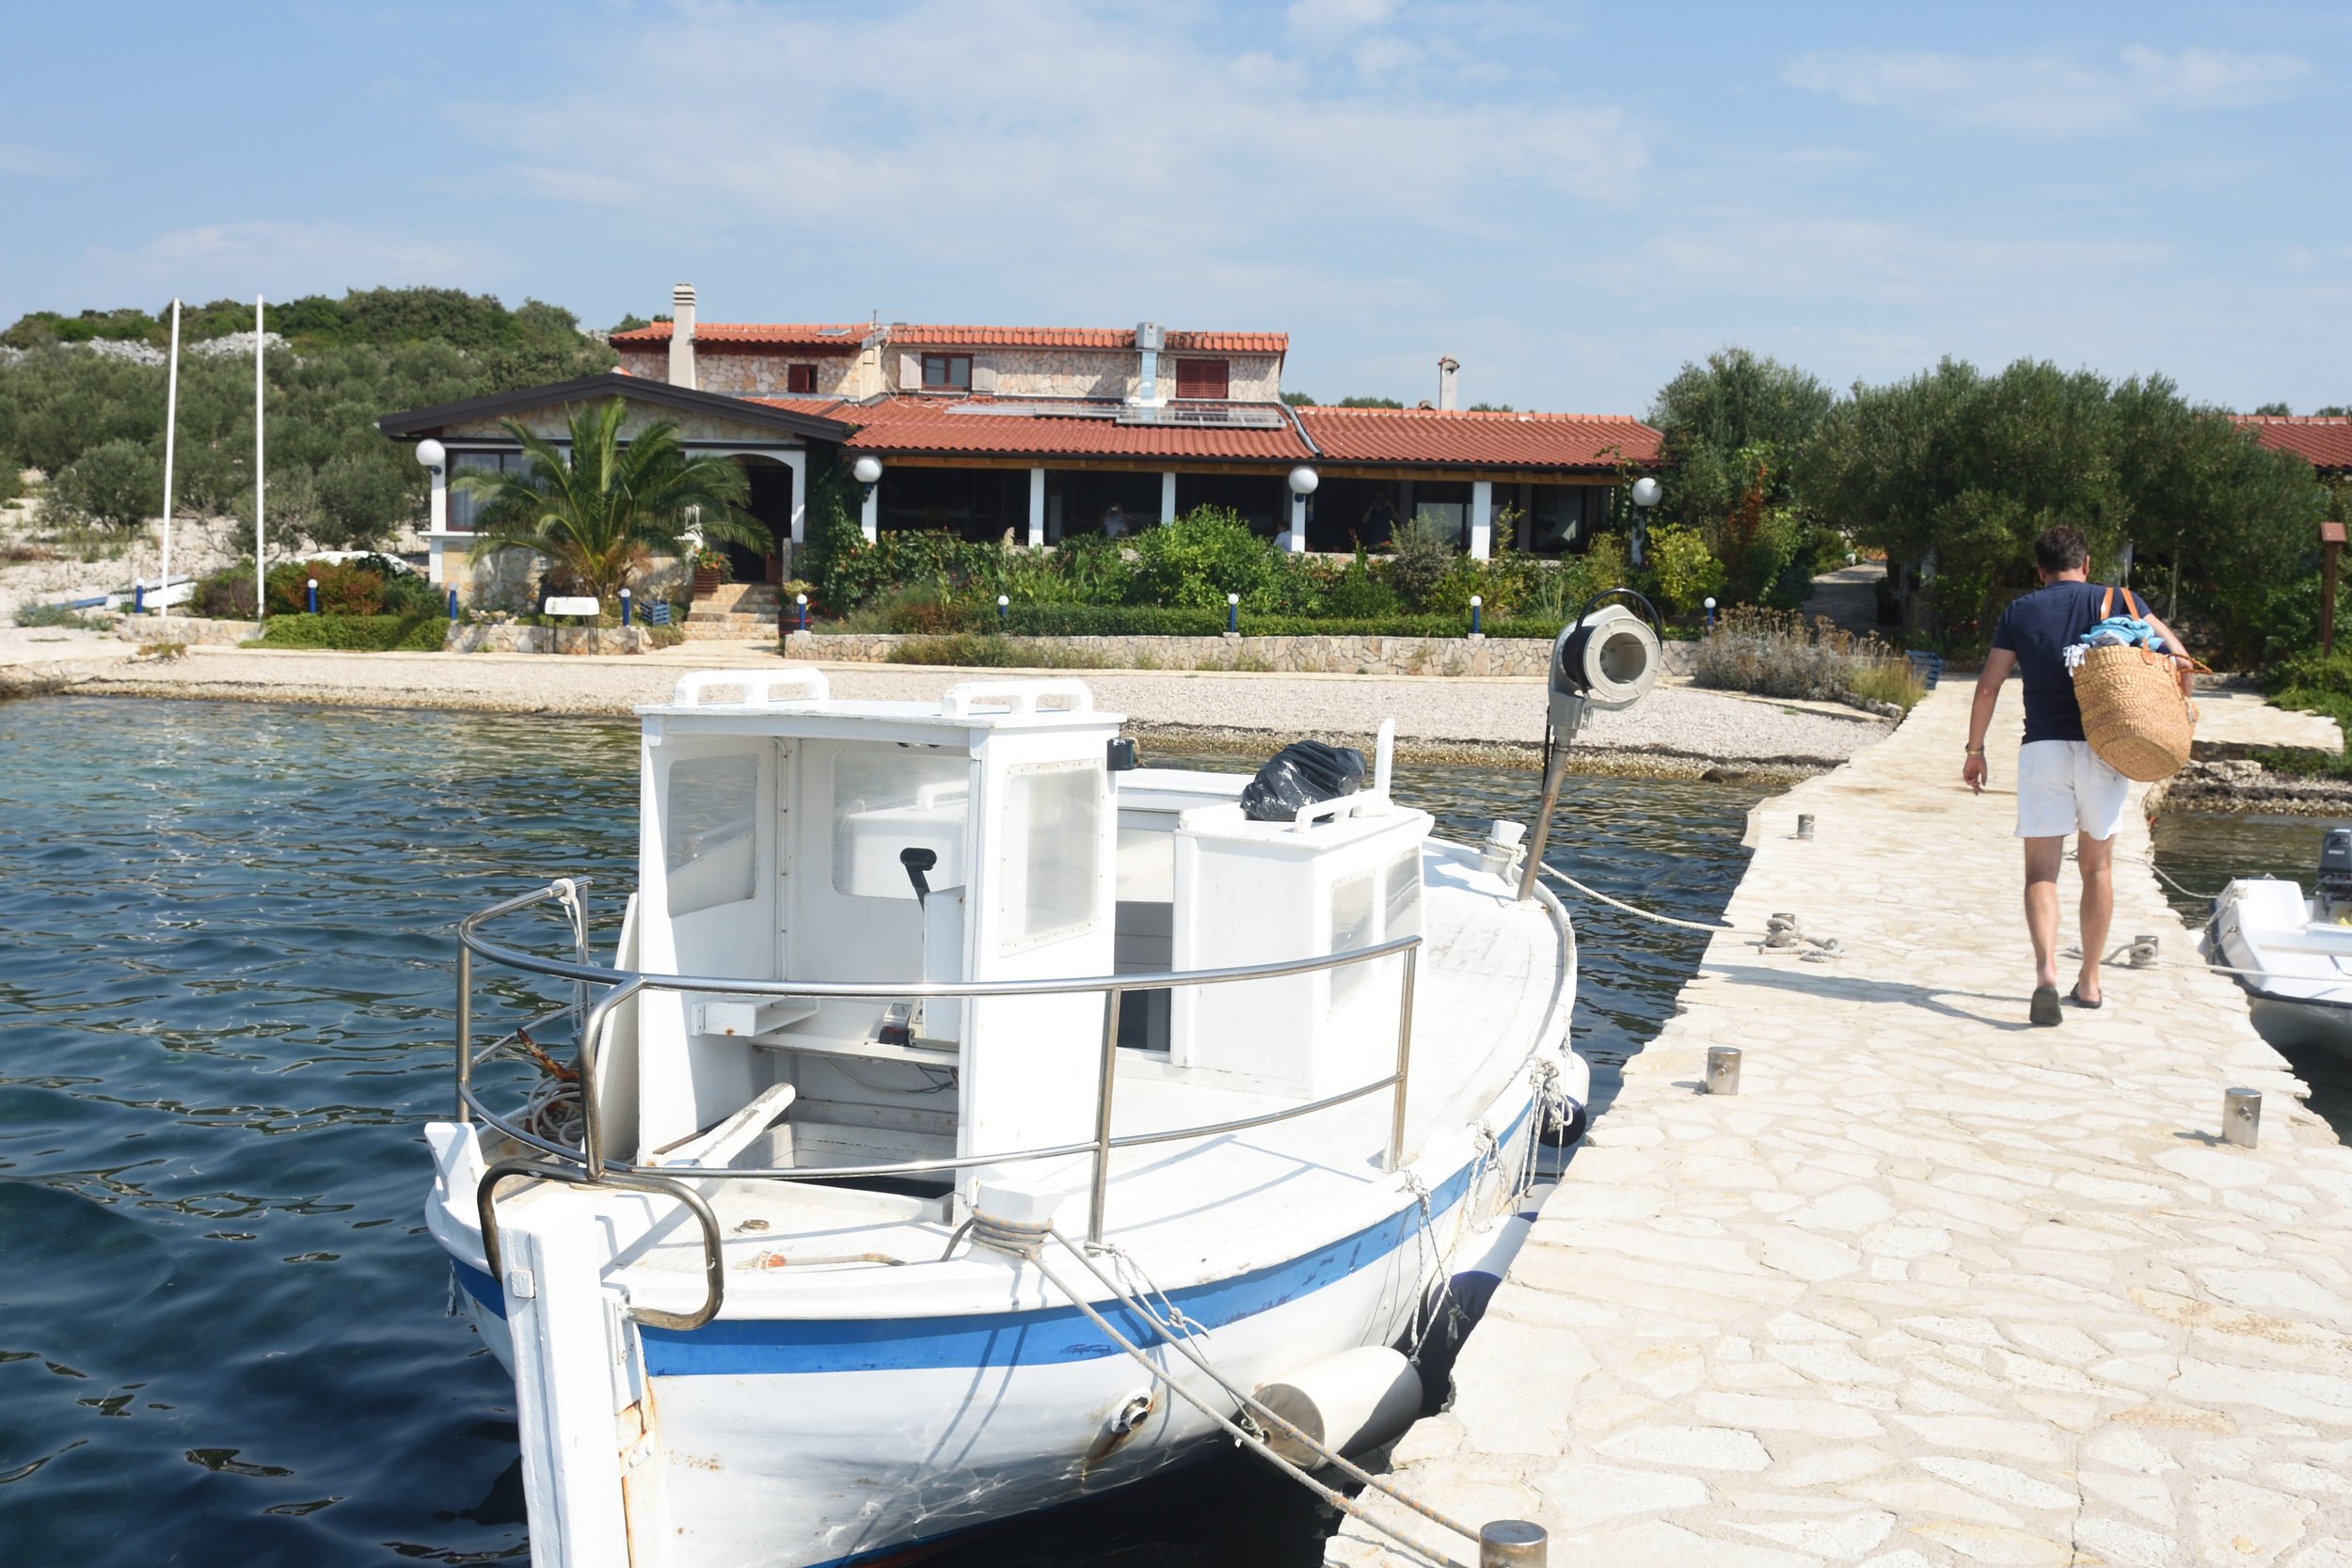 Ashore on a small island Kornati Islands